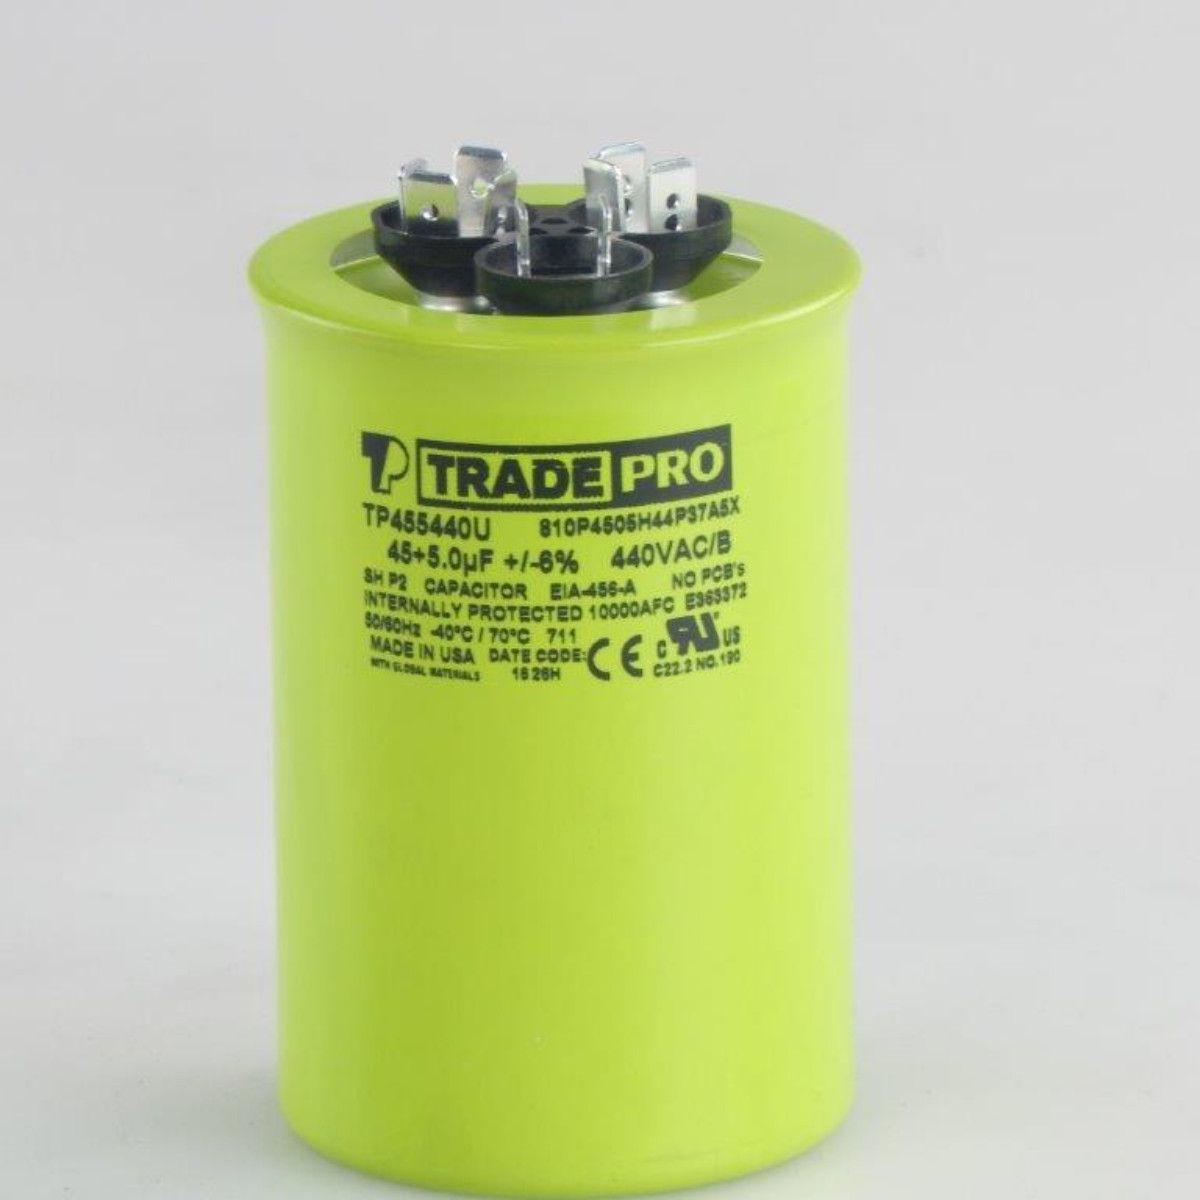 TRADEPRO® Round 'USA' Run Capacitor - 45+5 MFD - 440V